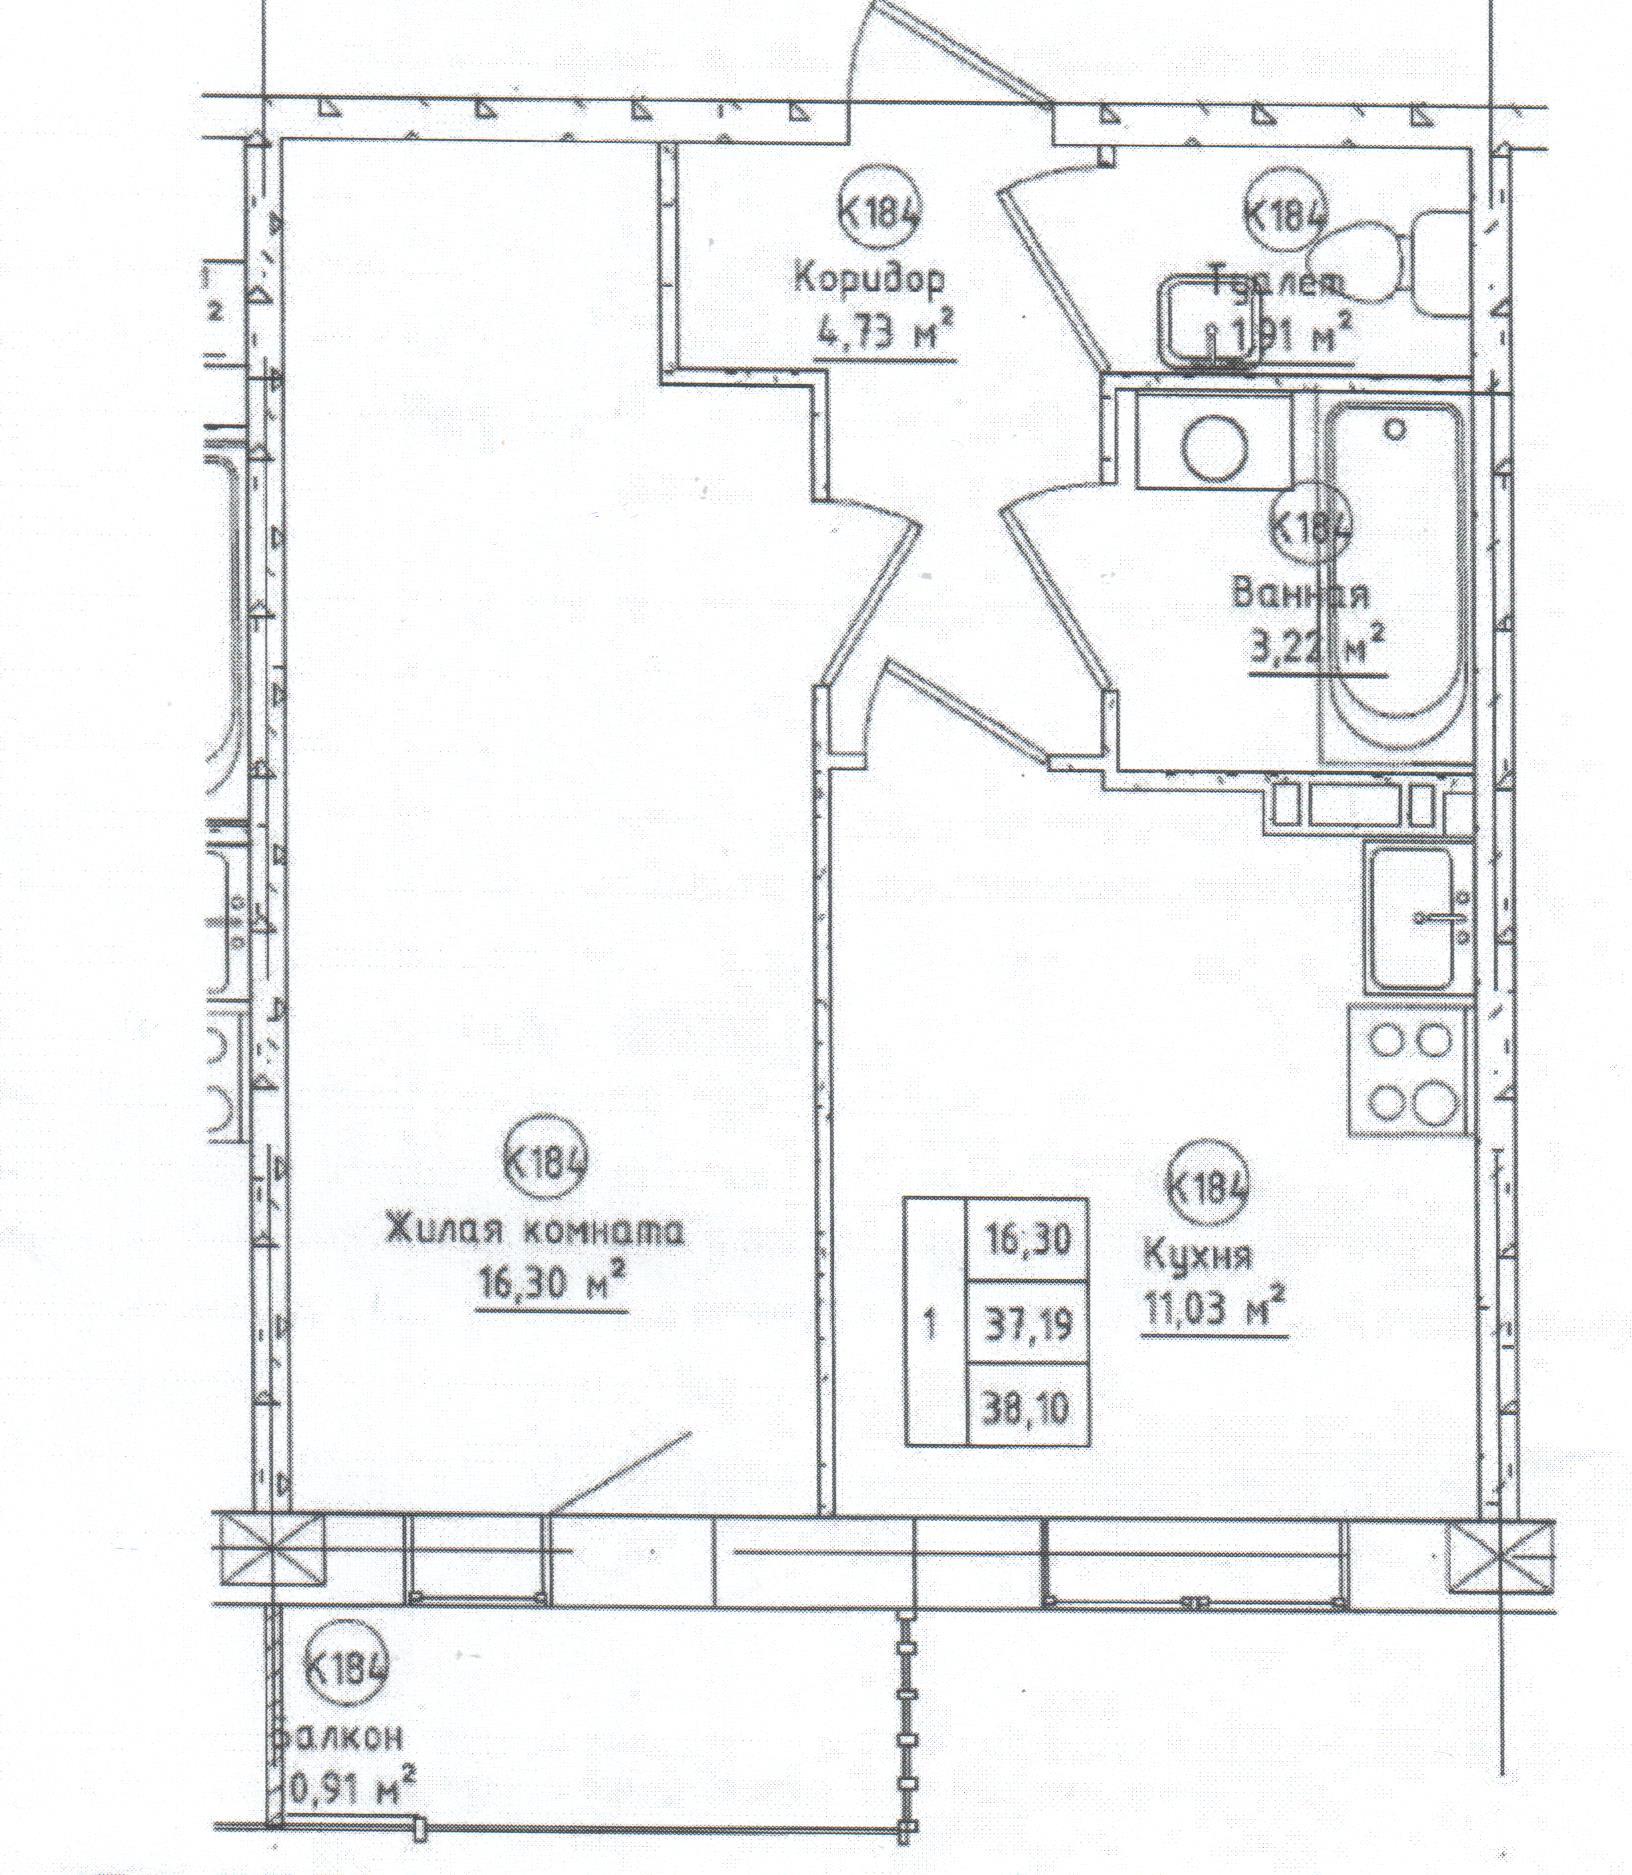 Лабораторный проспект, д.23